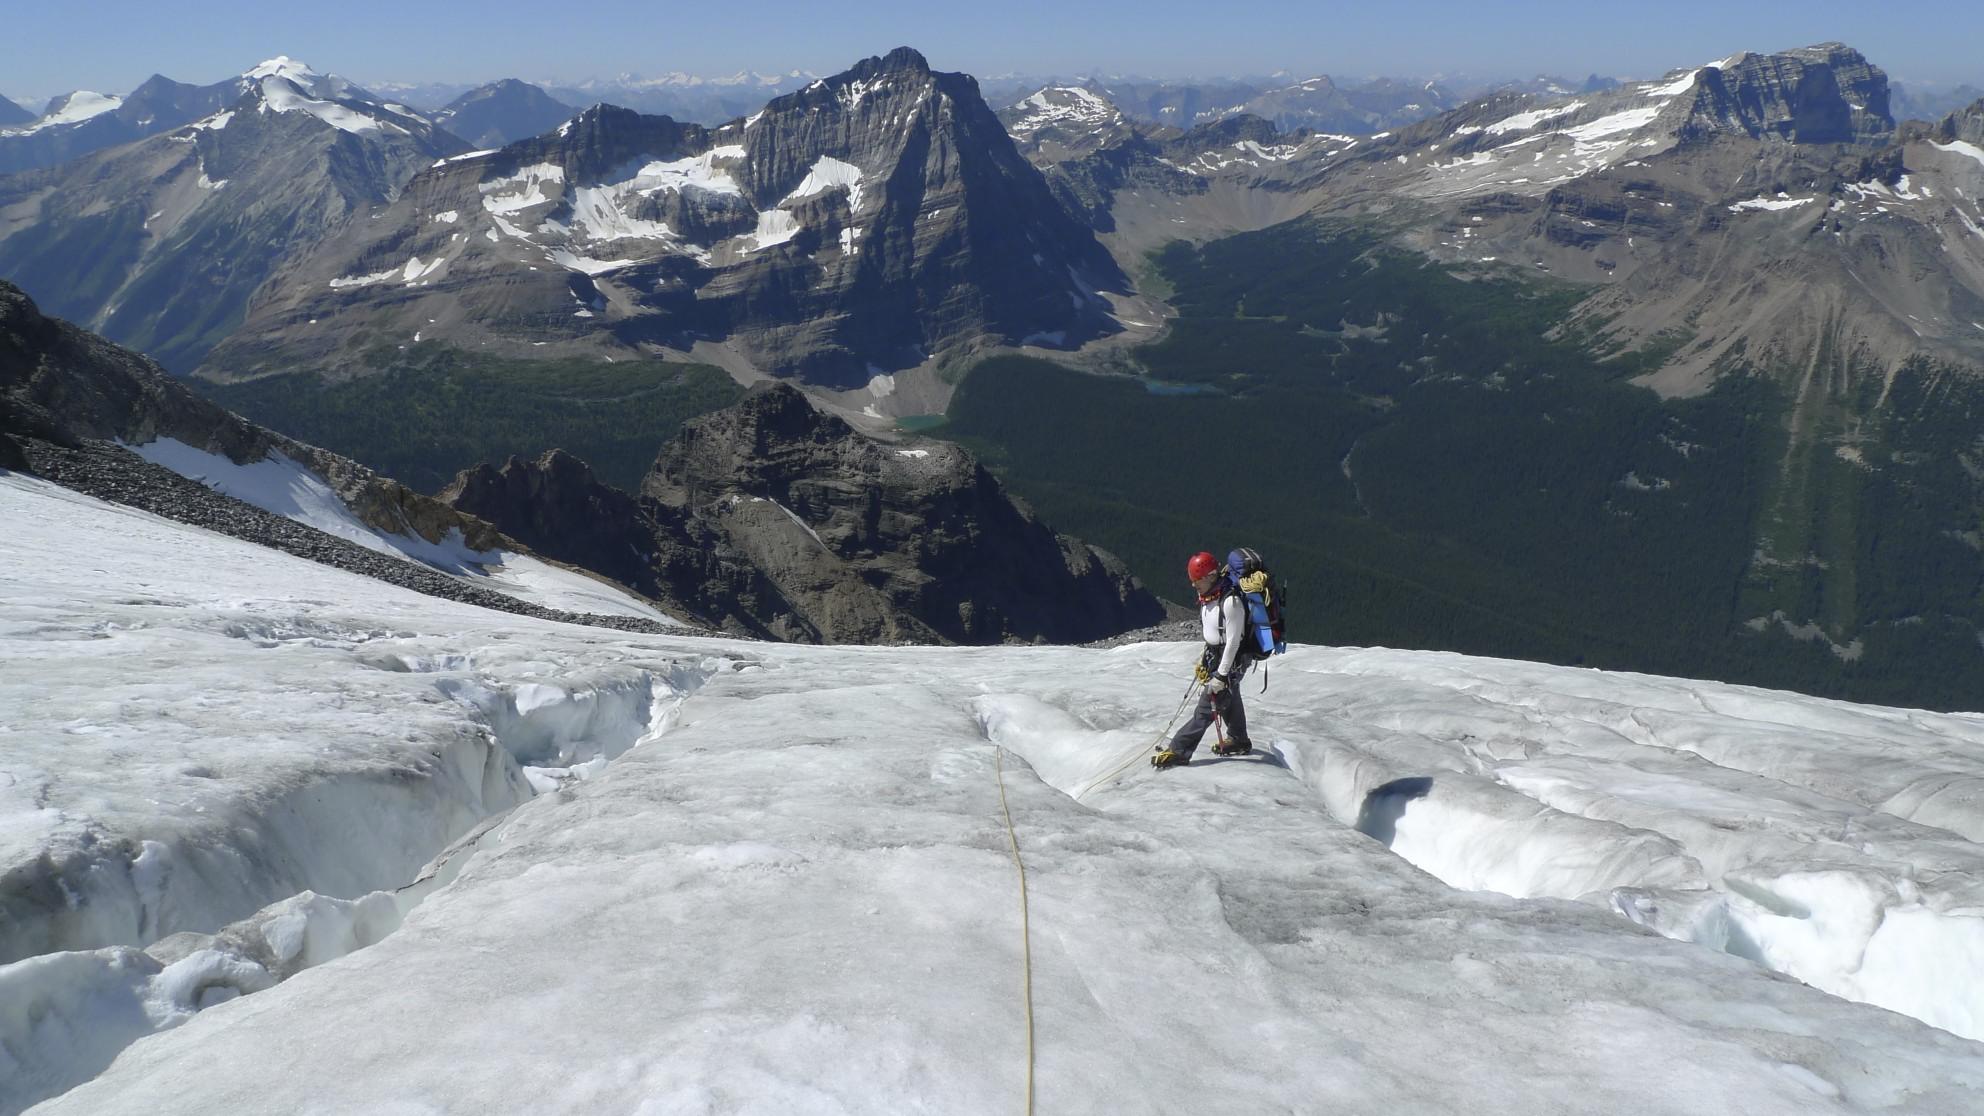 On Huber/Victoria Glacier